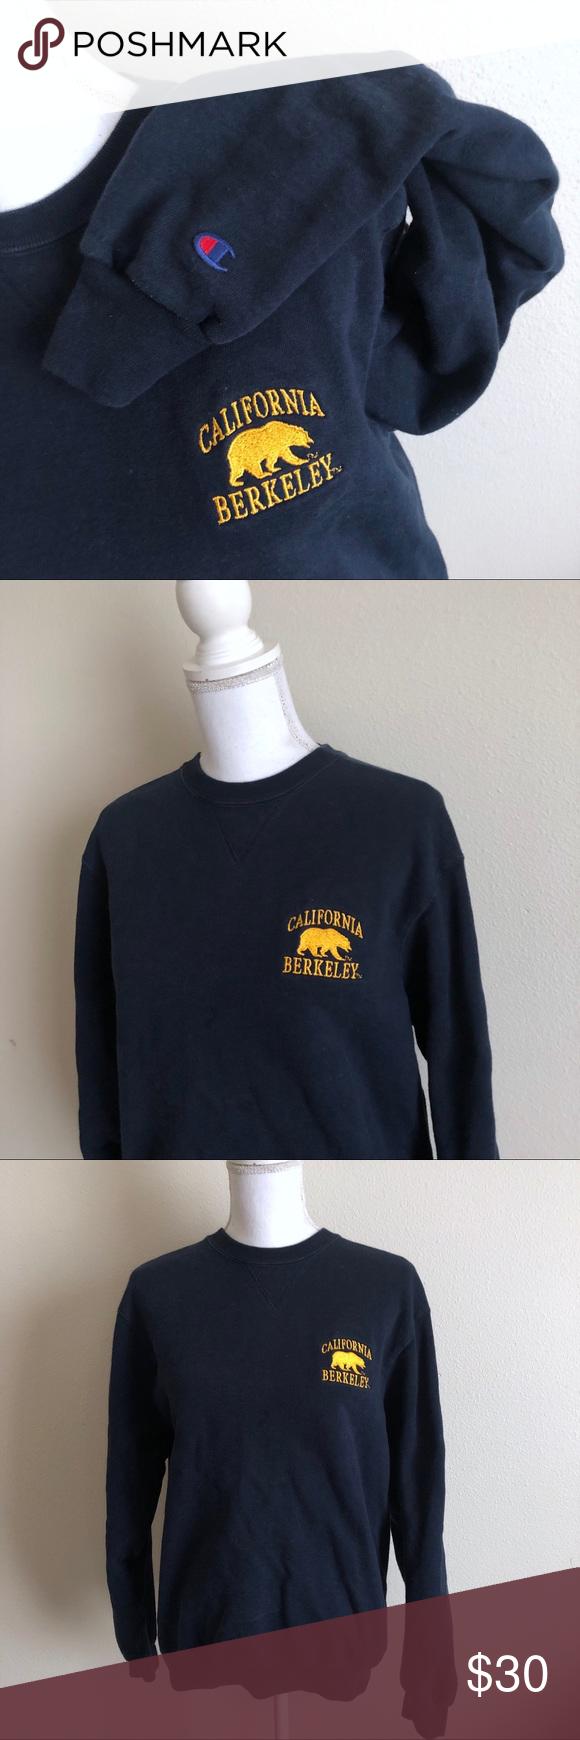 Berkeley Champion Sweatshirt Champion Sweatshirt Sweatshirts Champion Tops [ 1740 x 580 Pixel ]